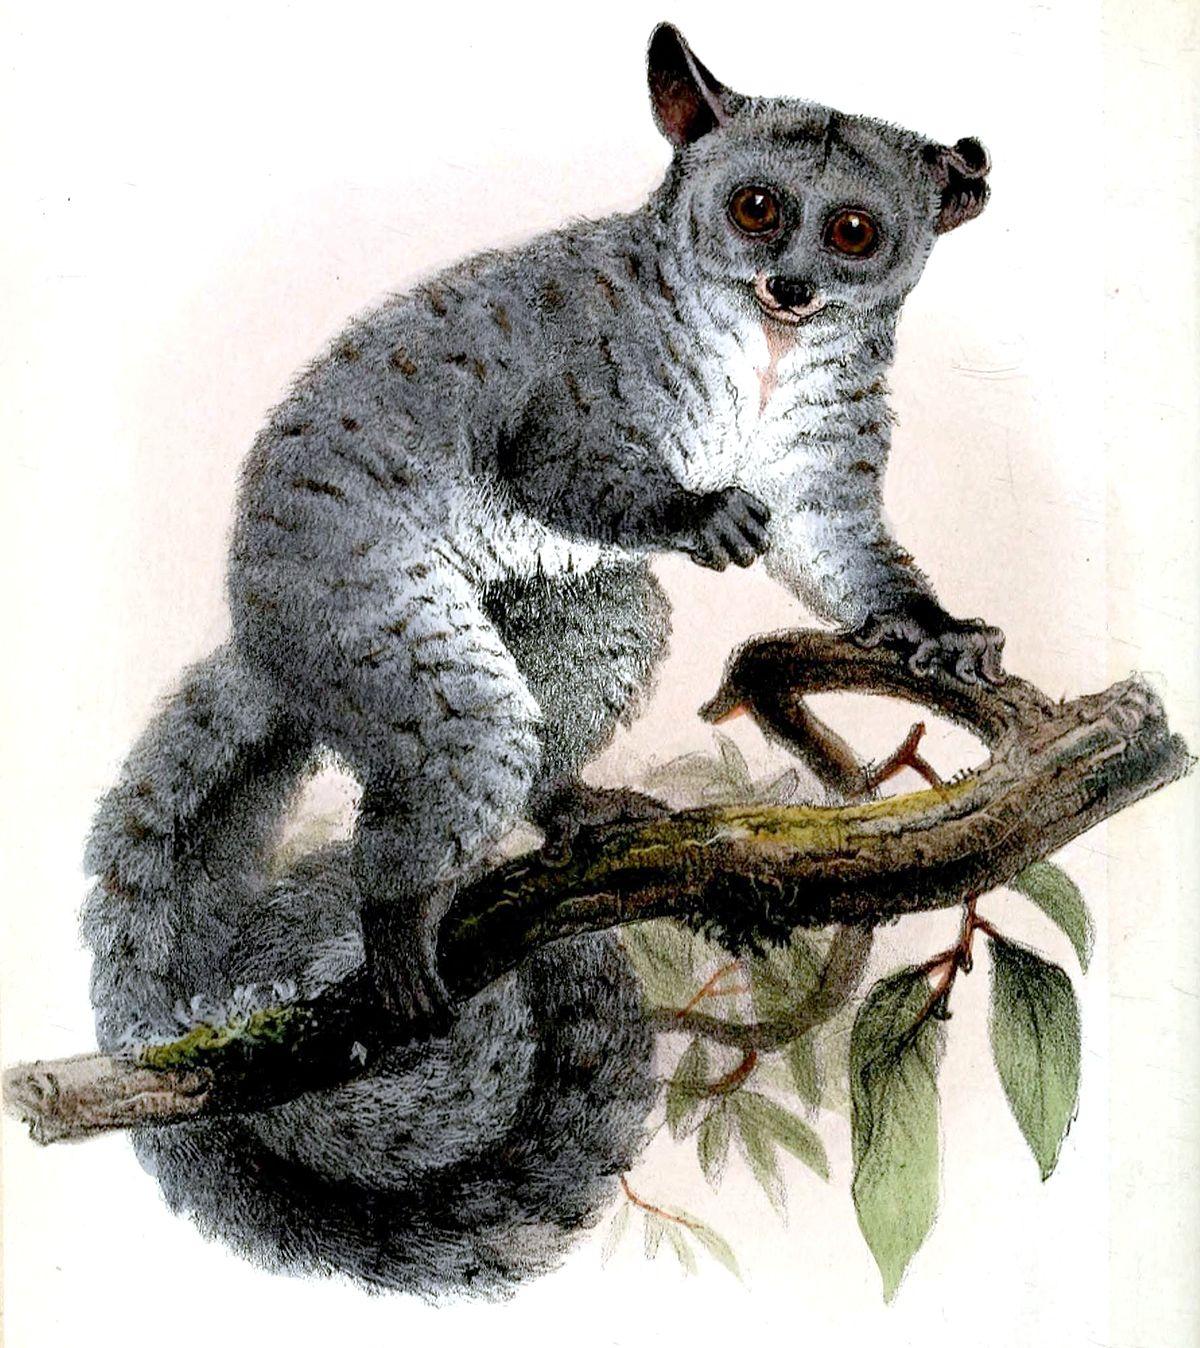 Silvery greater galago - Wikipedia